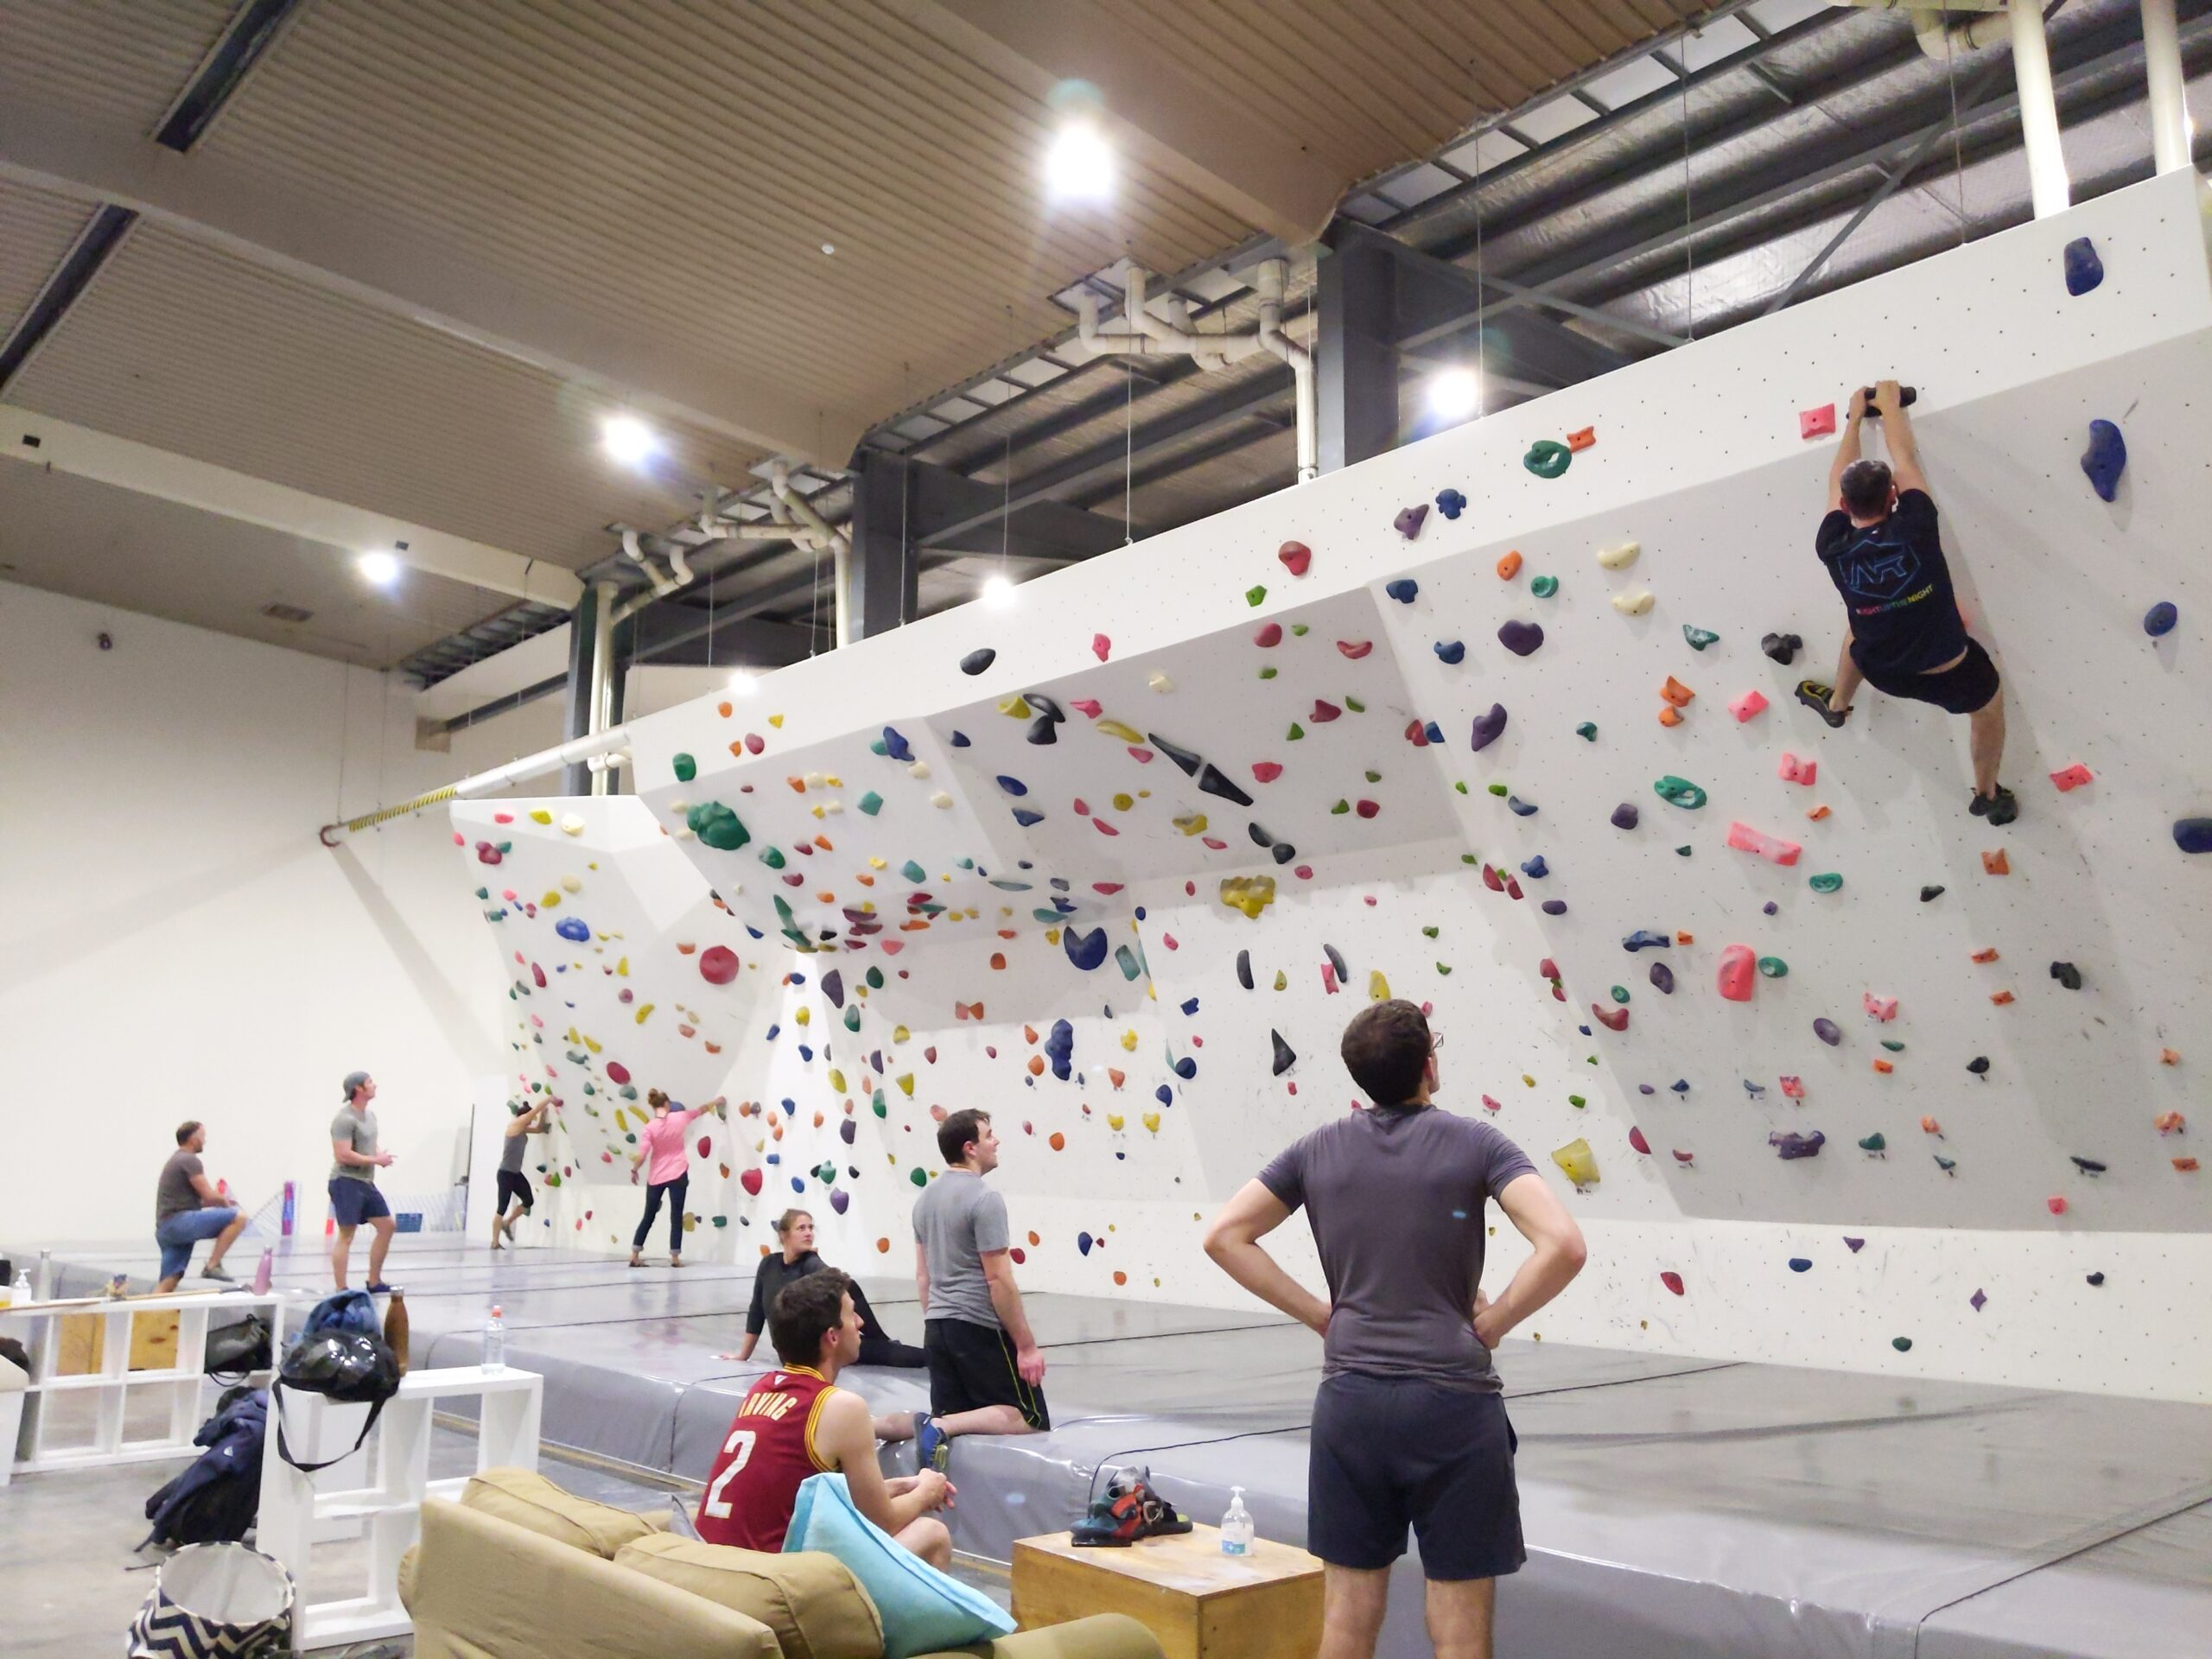 Experienced Climbers